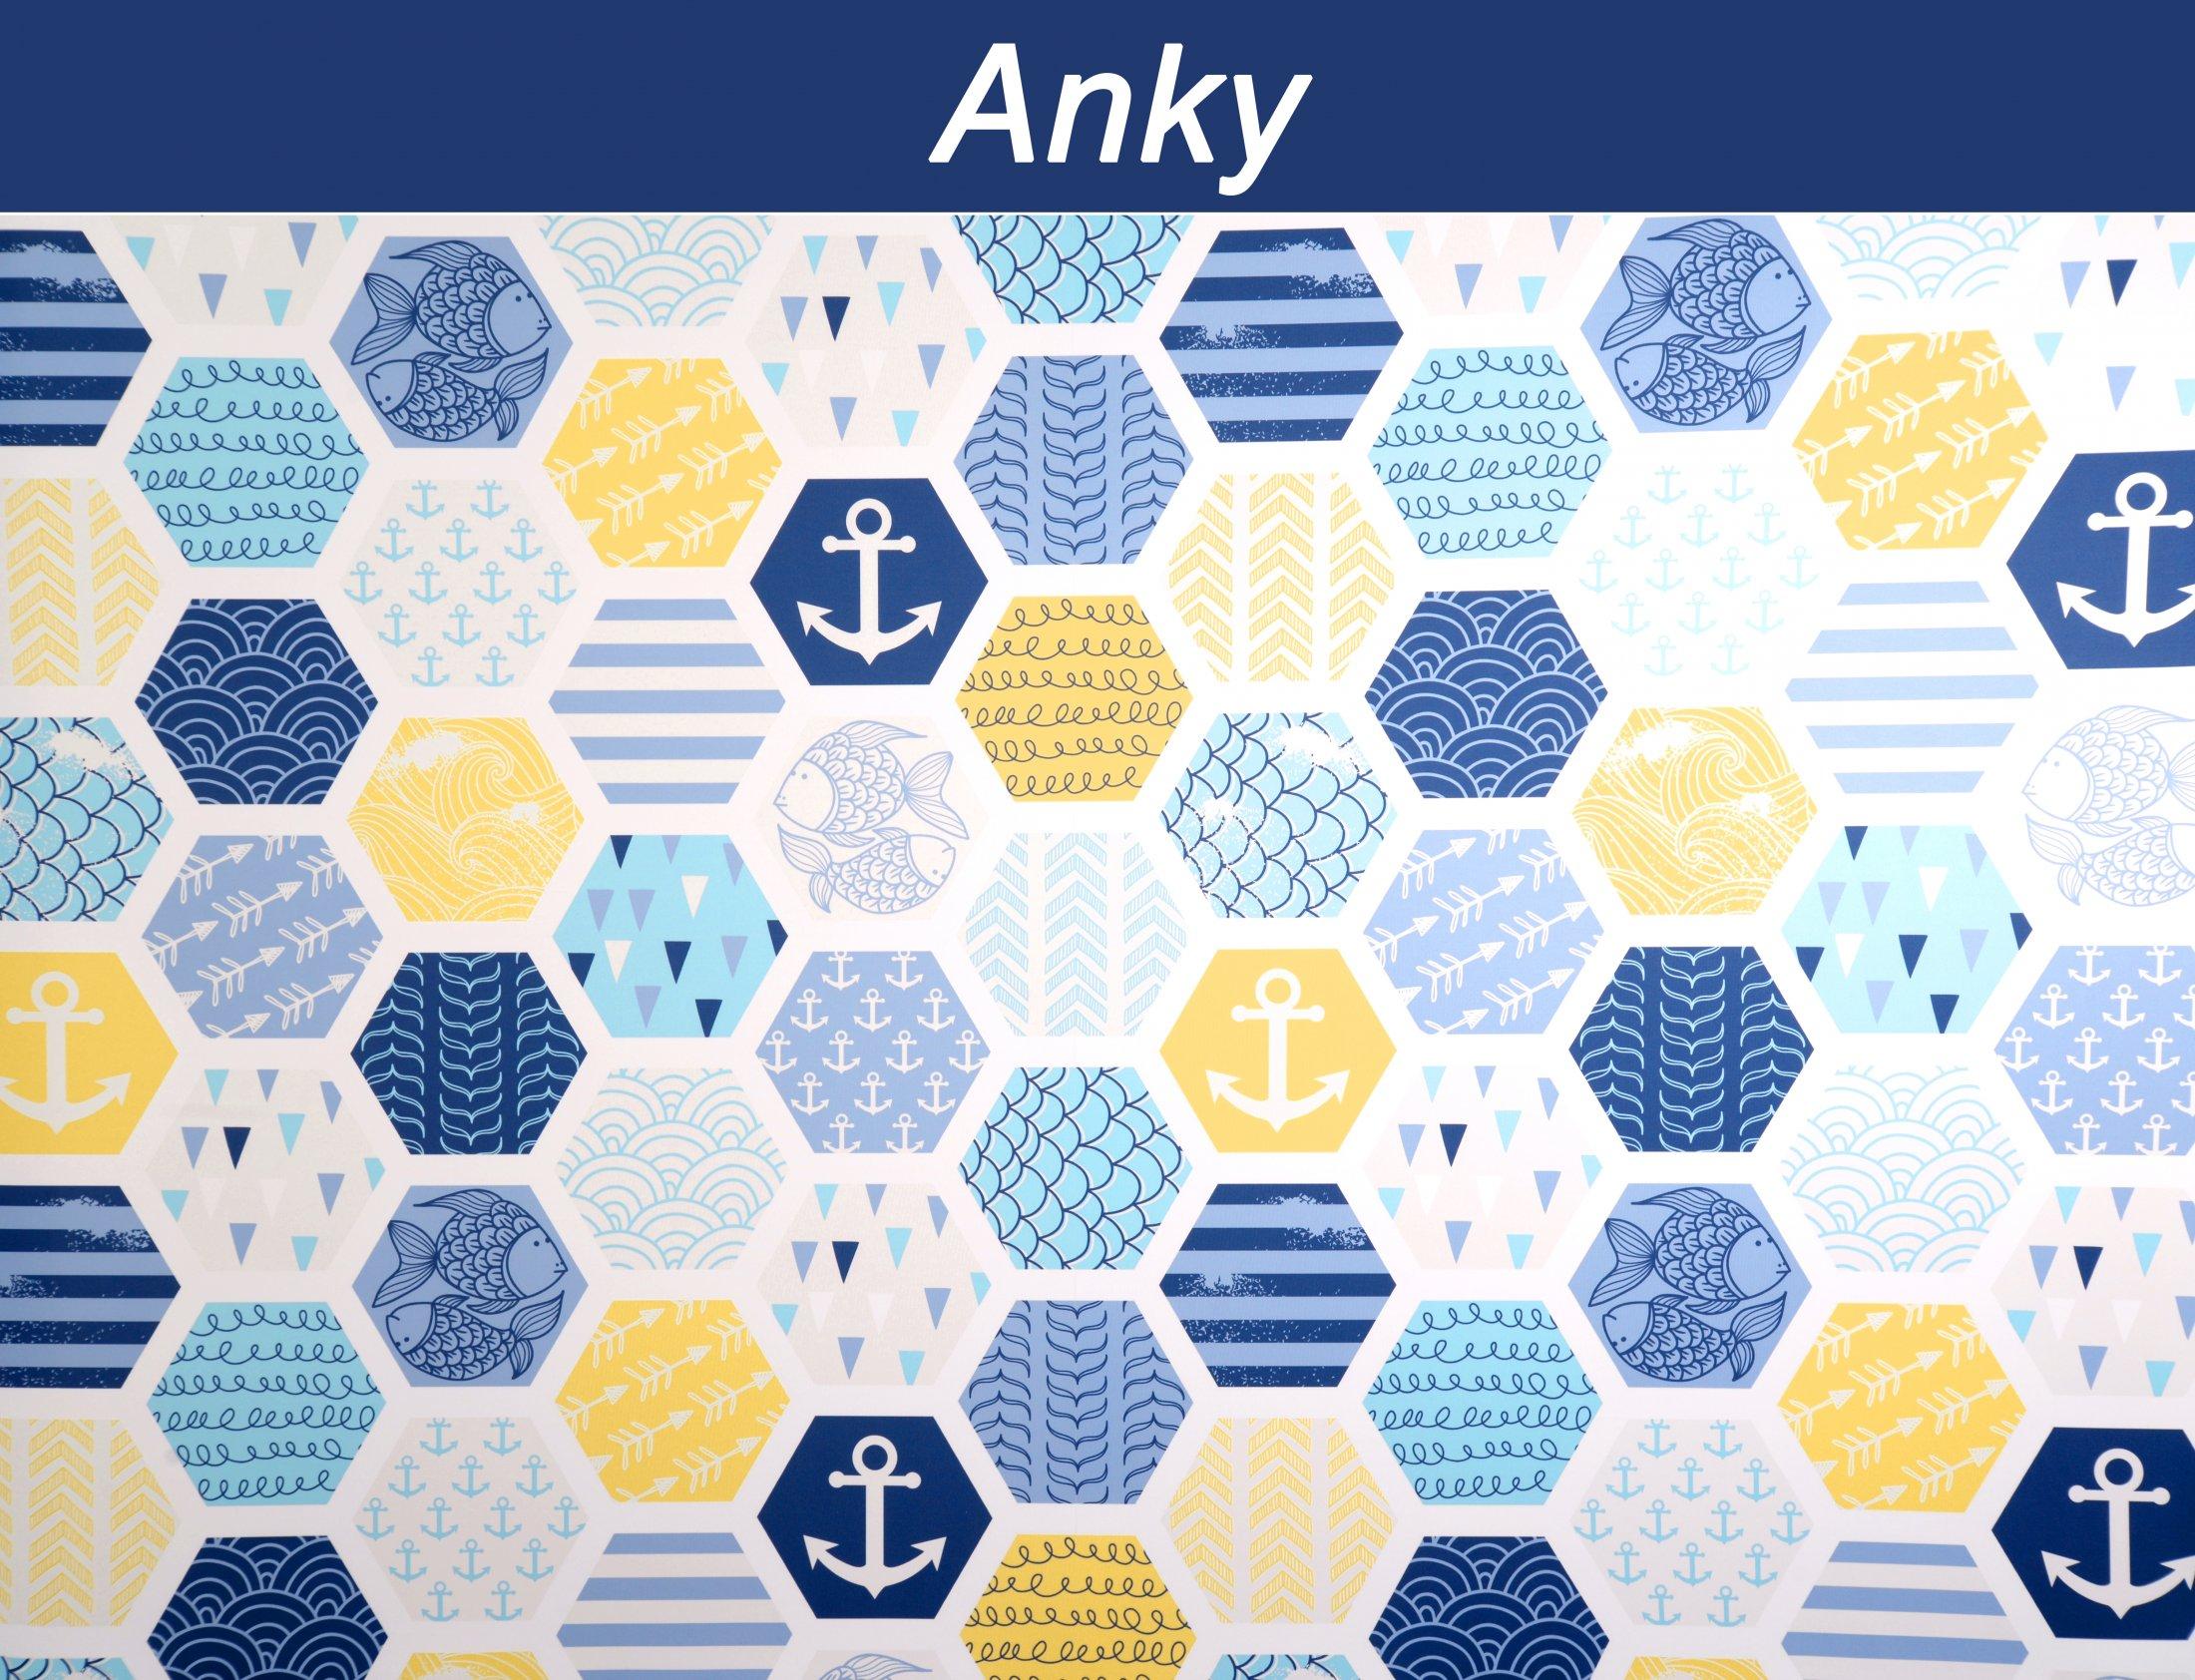 40 Anky